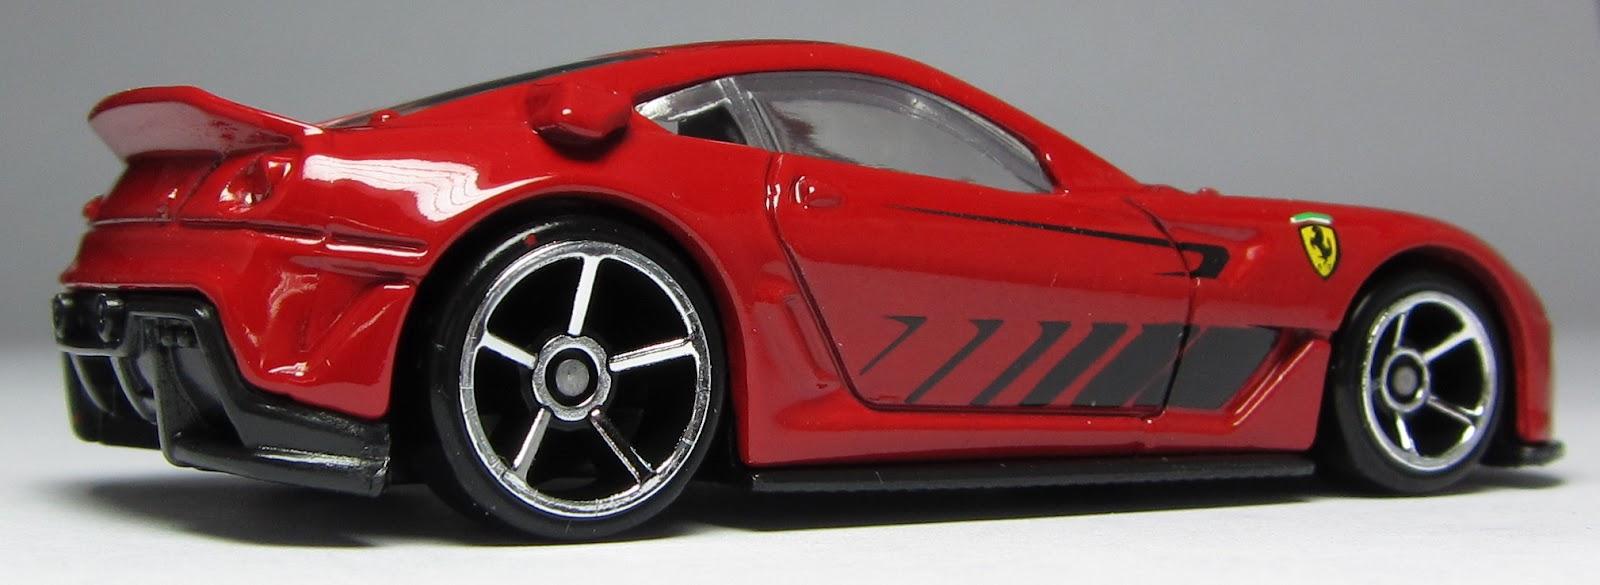 Car Lamley Group Dlmer S View Hot Wheels Ferrari 599xx With Oh5 Wheels